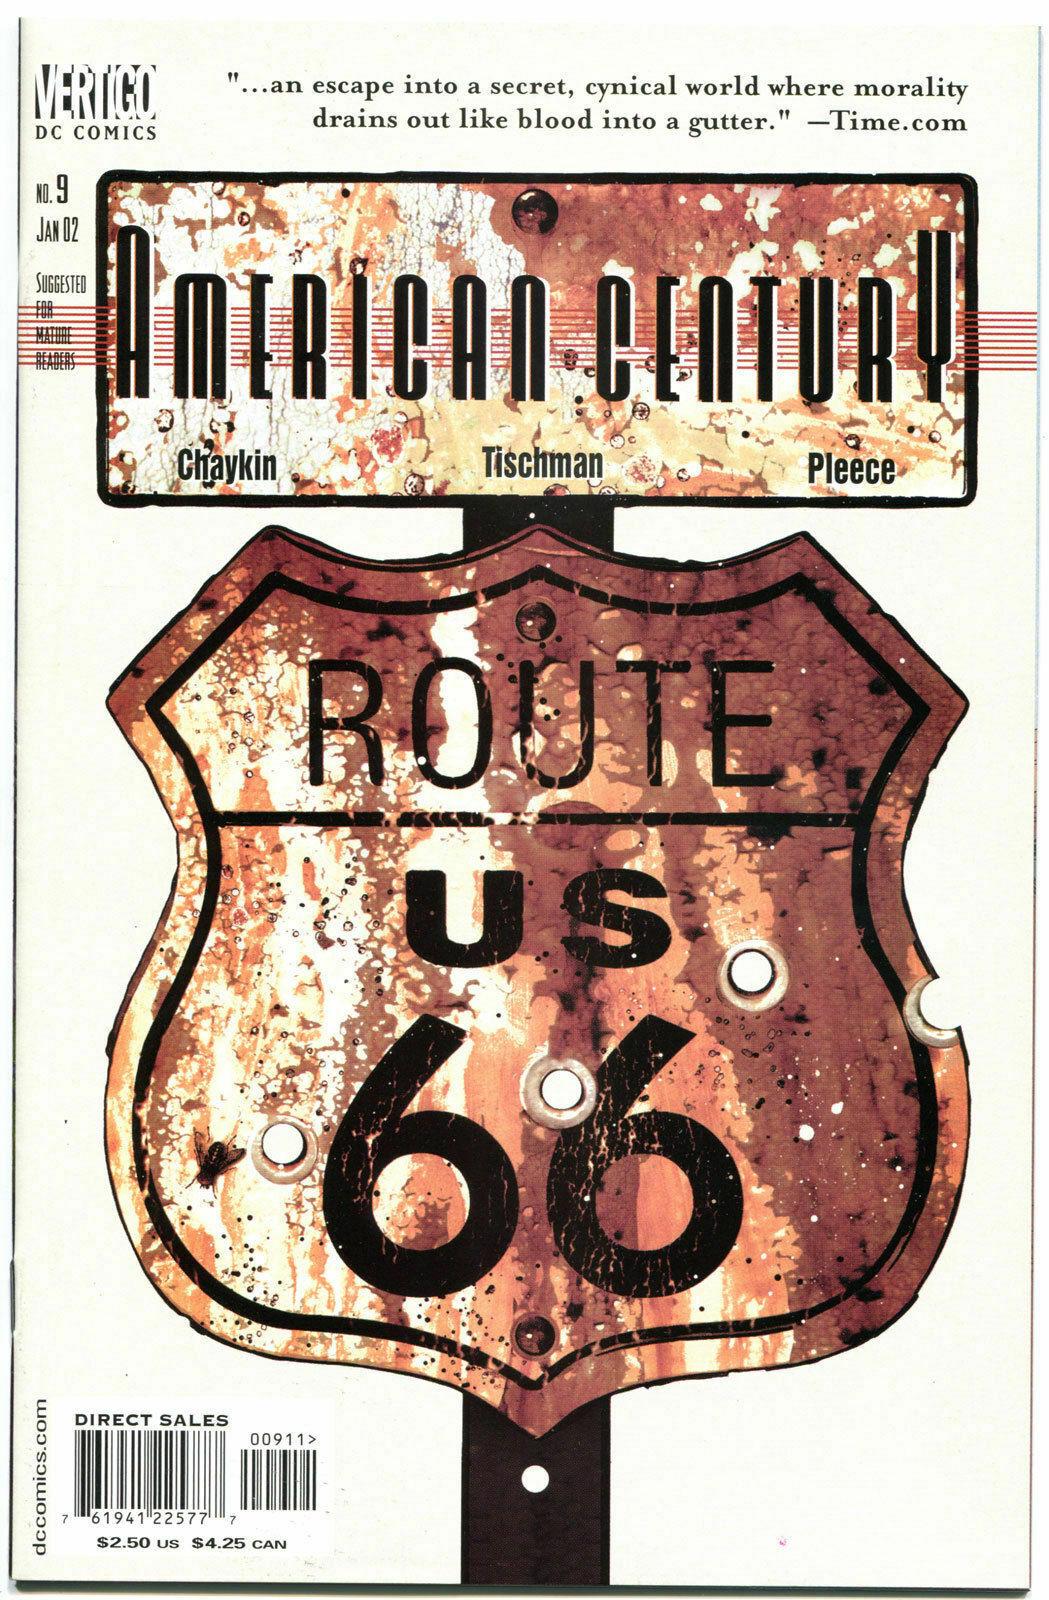 AMERICAN CENTURY #9, NM+, Howard Chaykin, 2001, more Vertigo in store    Comic Books - Modern Age / HipComic